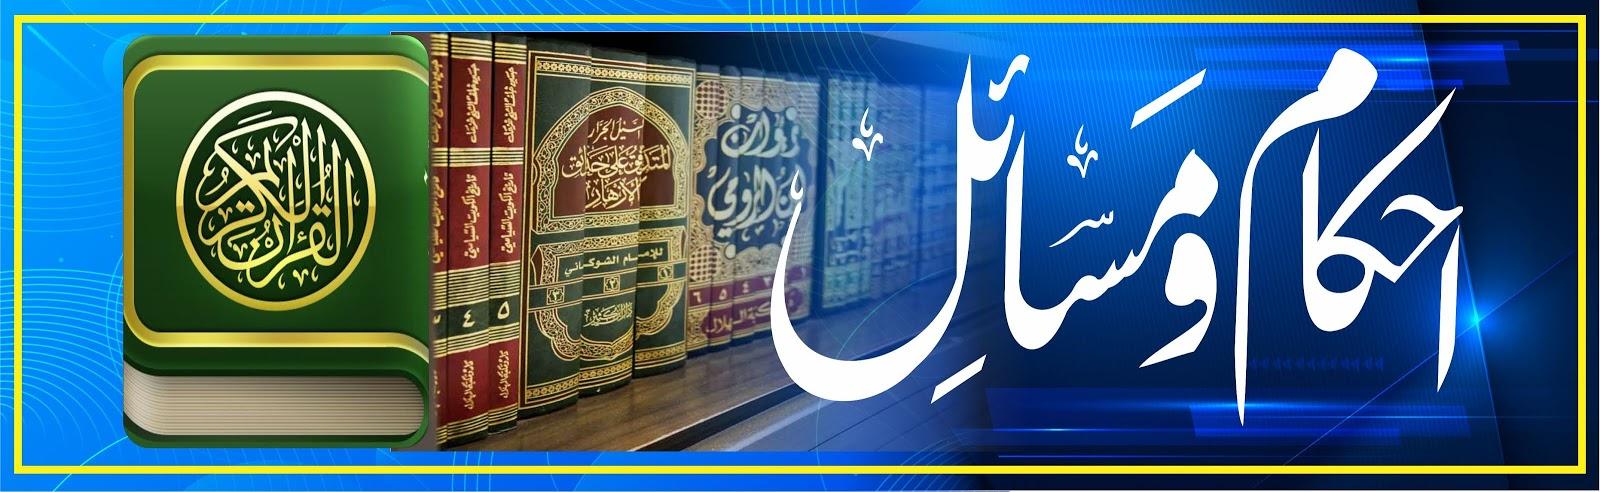 احکام ومسائل، رمضان، تراویح، روزہ، نا بالغ، قیام اللیل